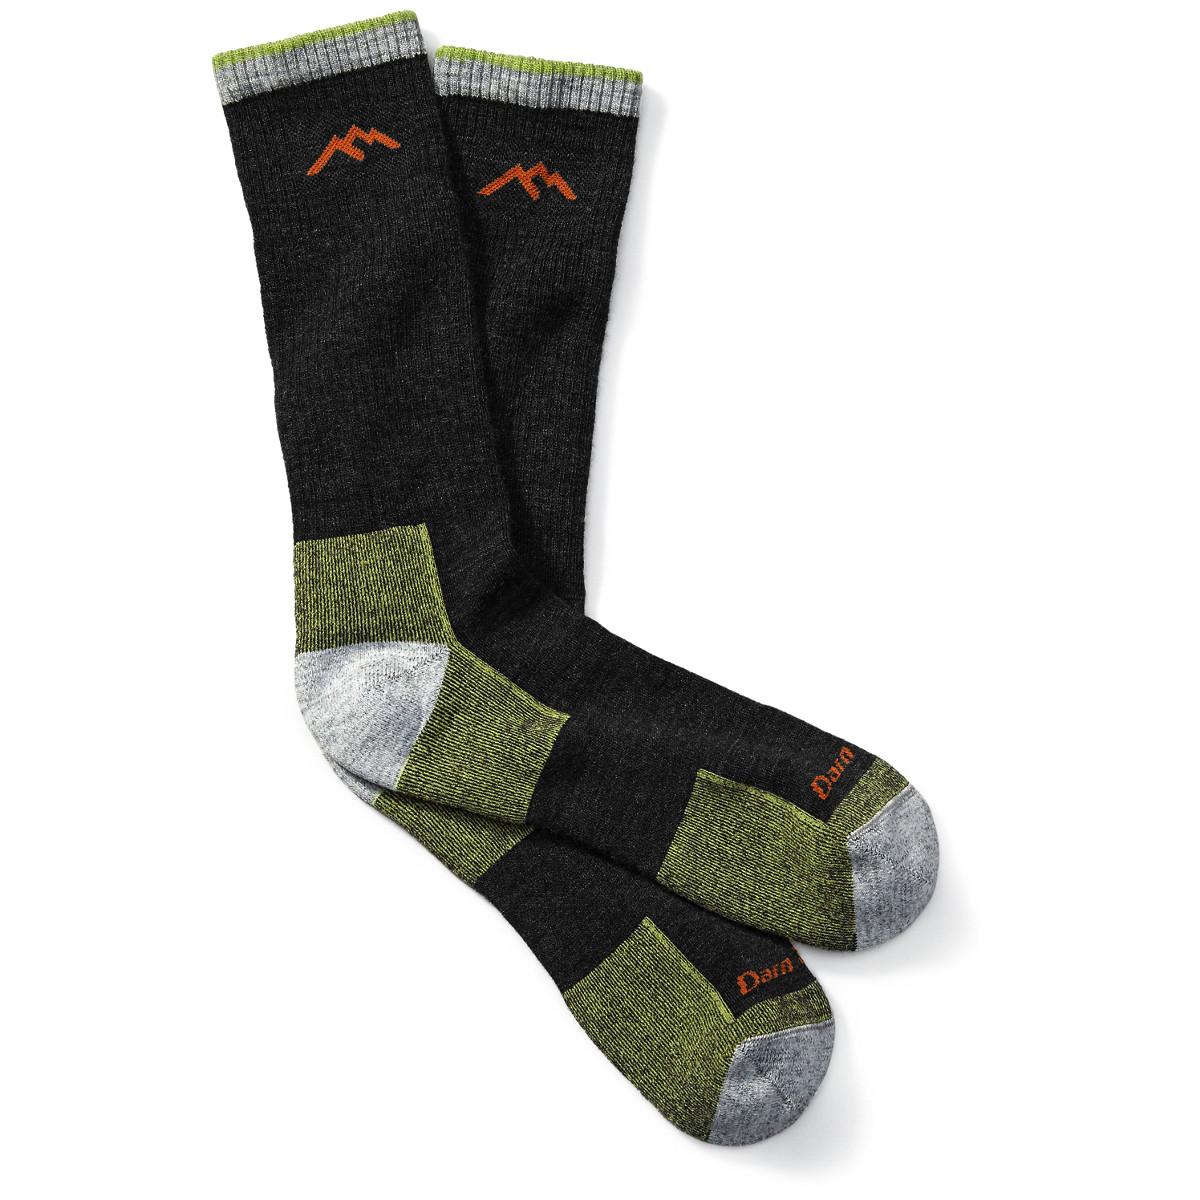 Darn Tough Hiker Boot Sock Cushion - Lime